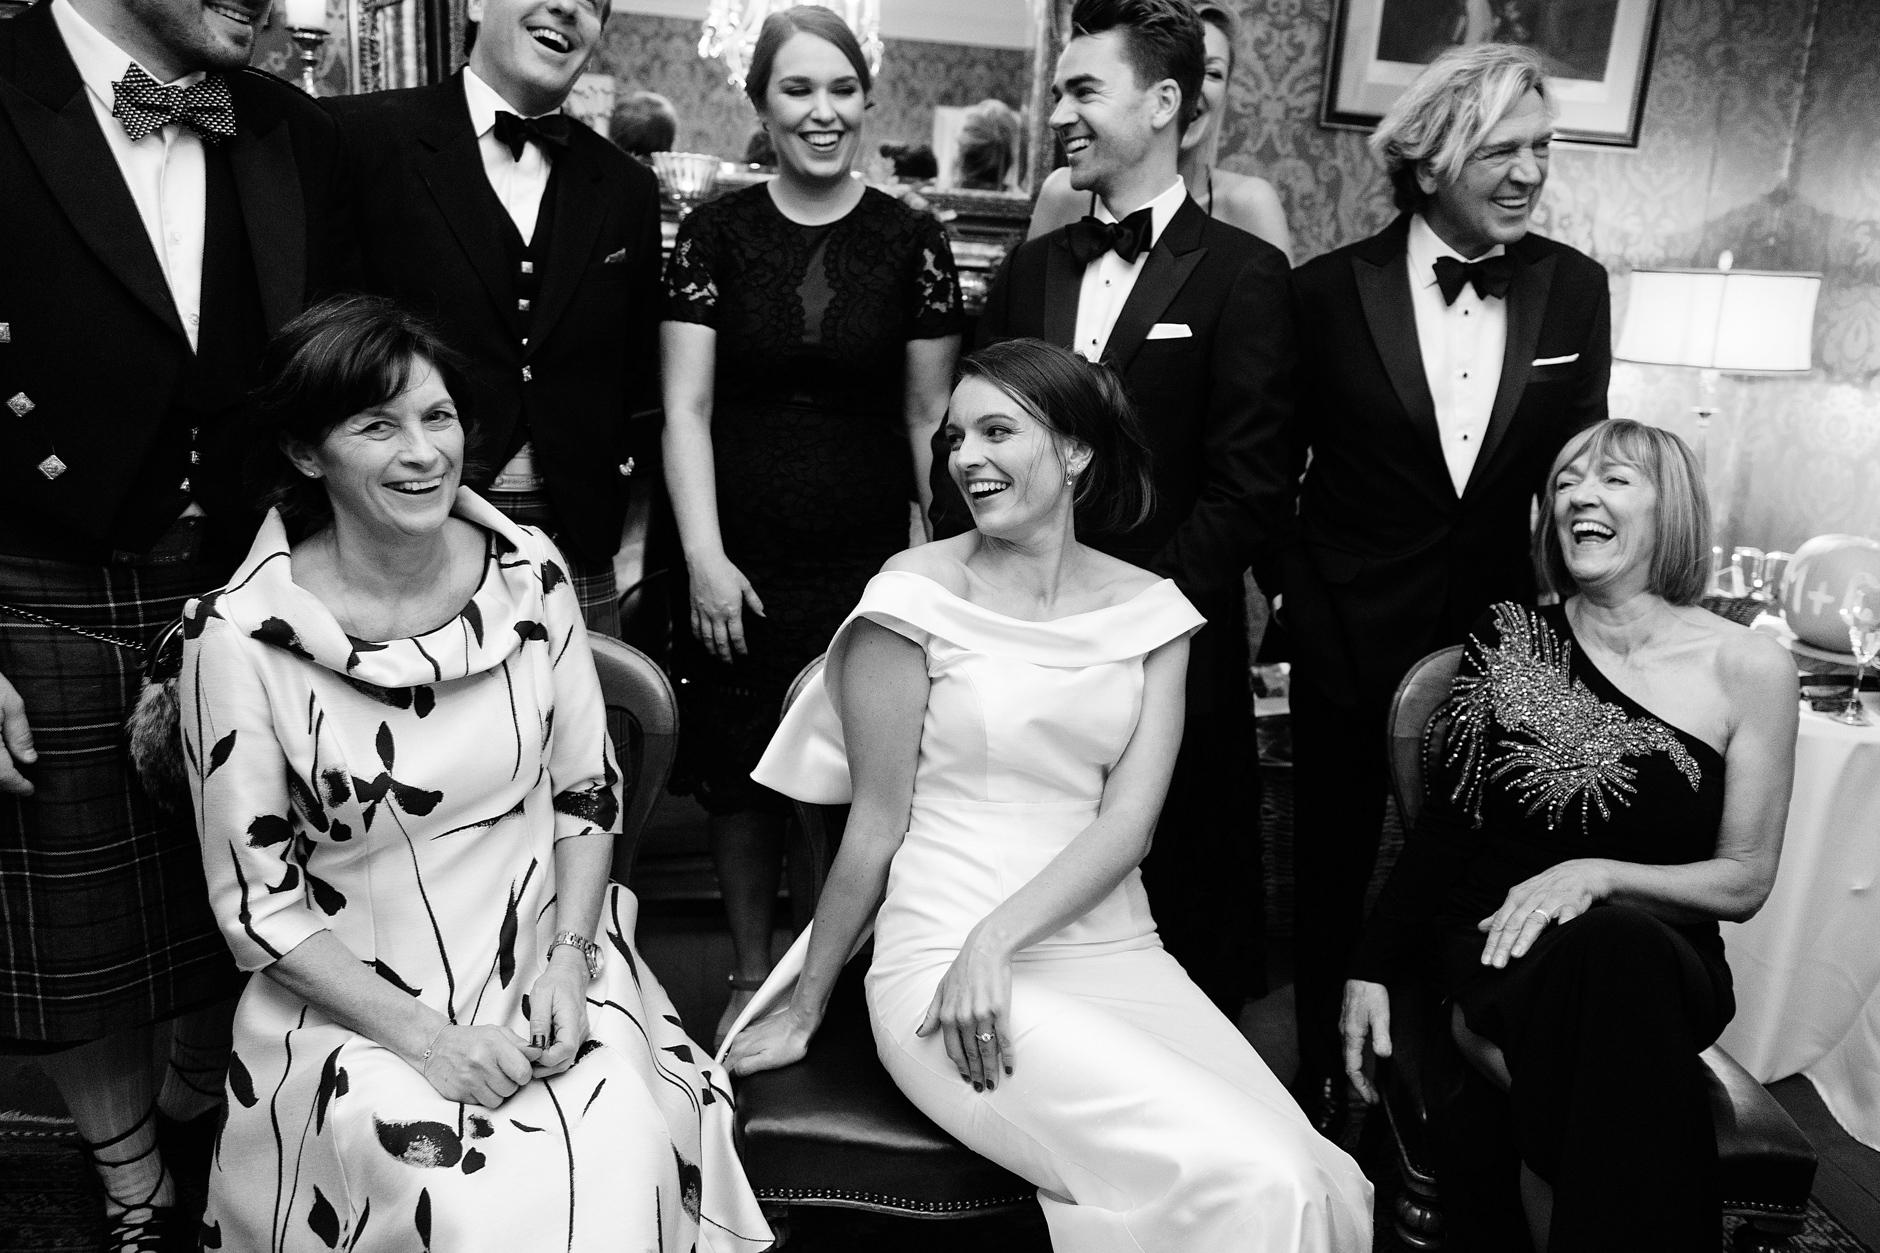 Glentruim-Wedding-Nikki-Leadbetter-Photography-237.jpg